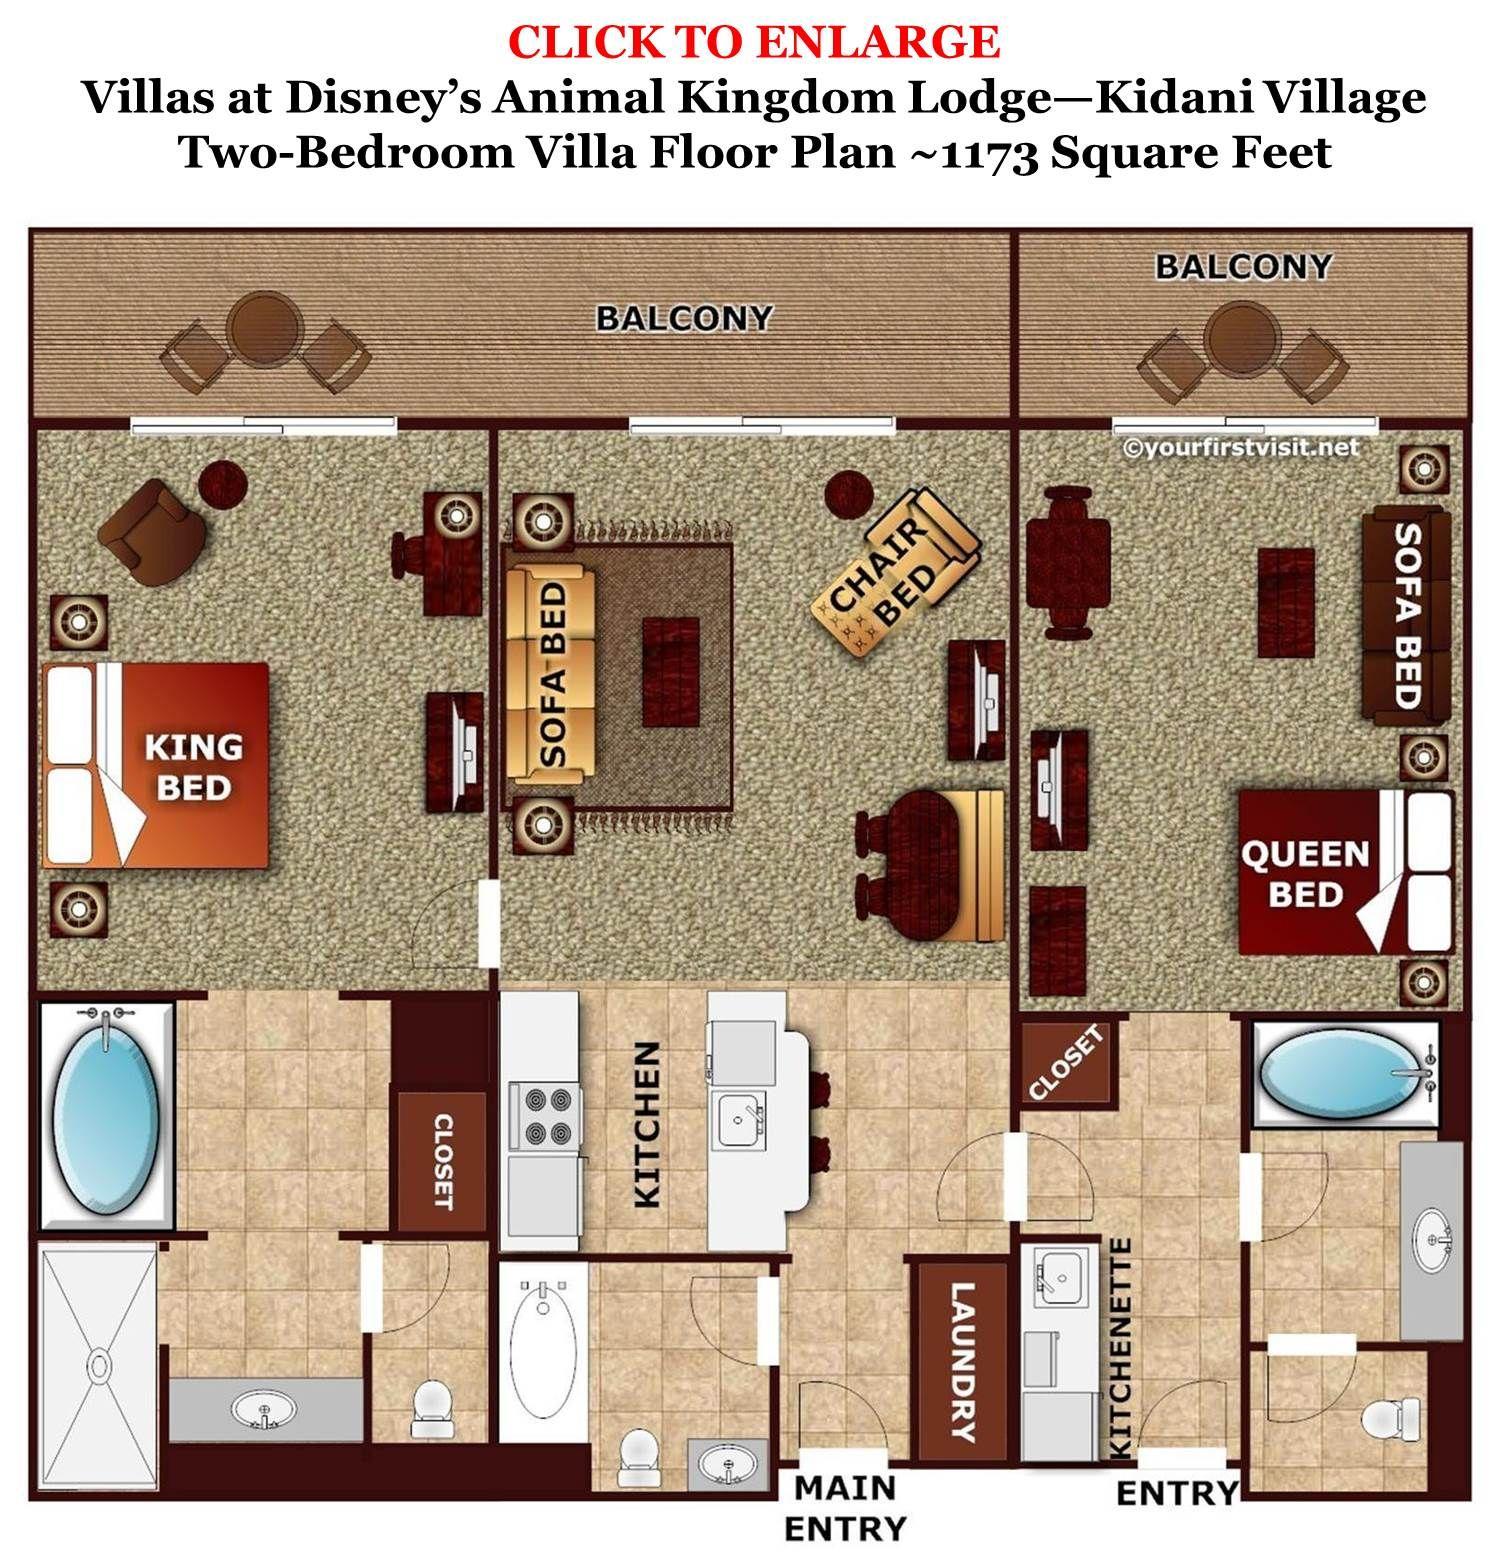 17 Best images about Disney World Deluxe Villa Resorts on Pinterest    Disney  Resorts and Villas. 17 Best images about Disney World Deluxe Villa Resorts on